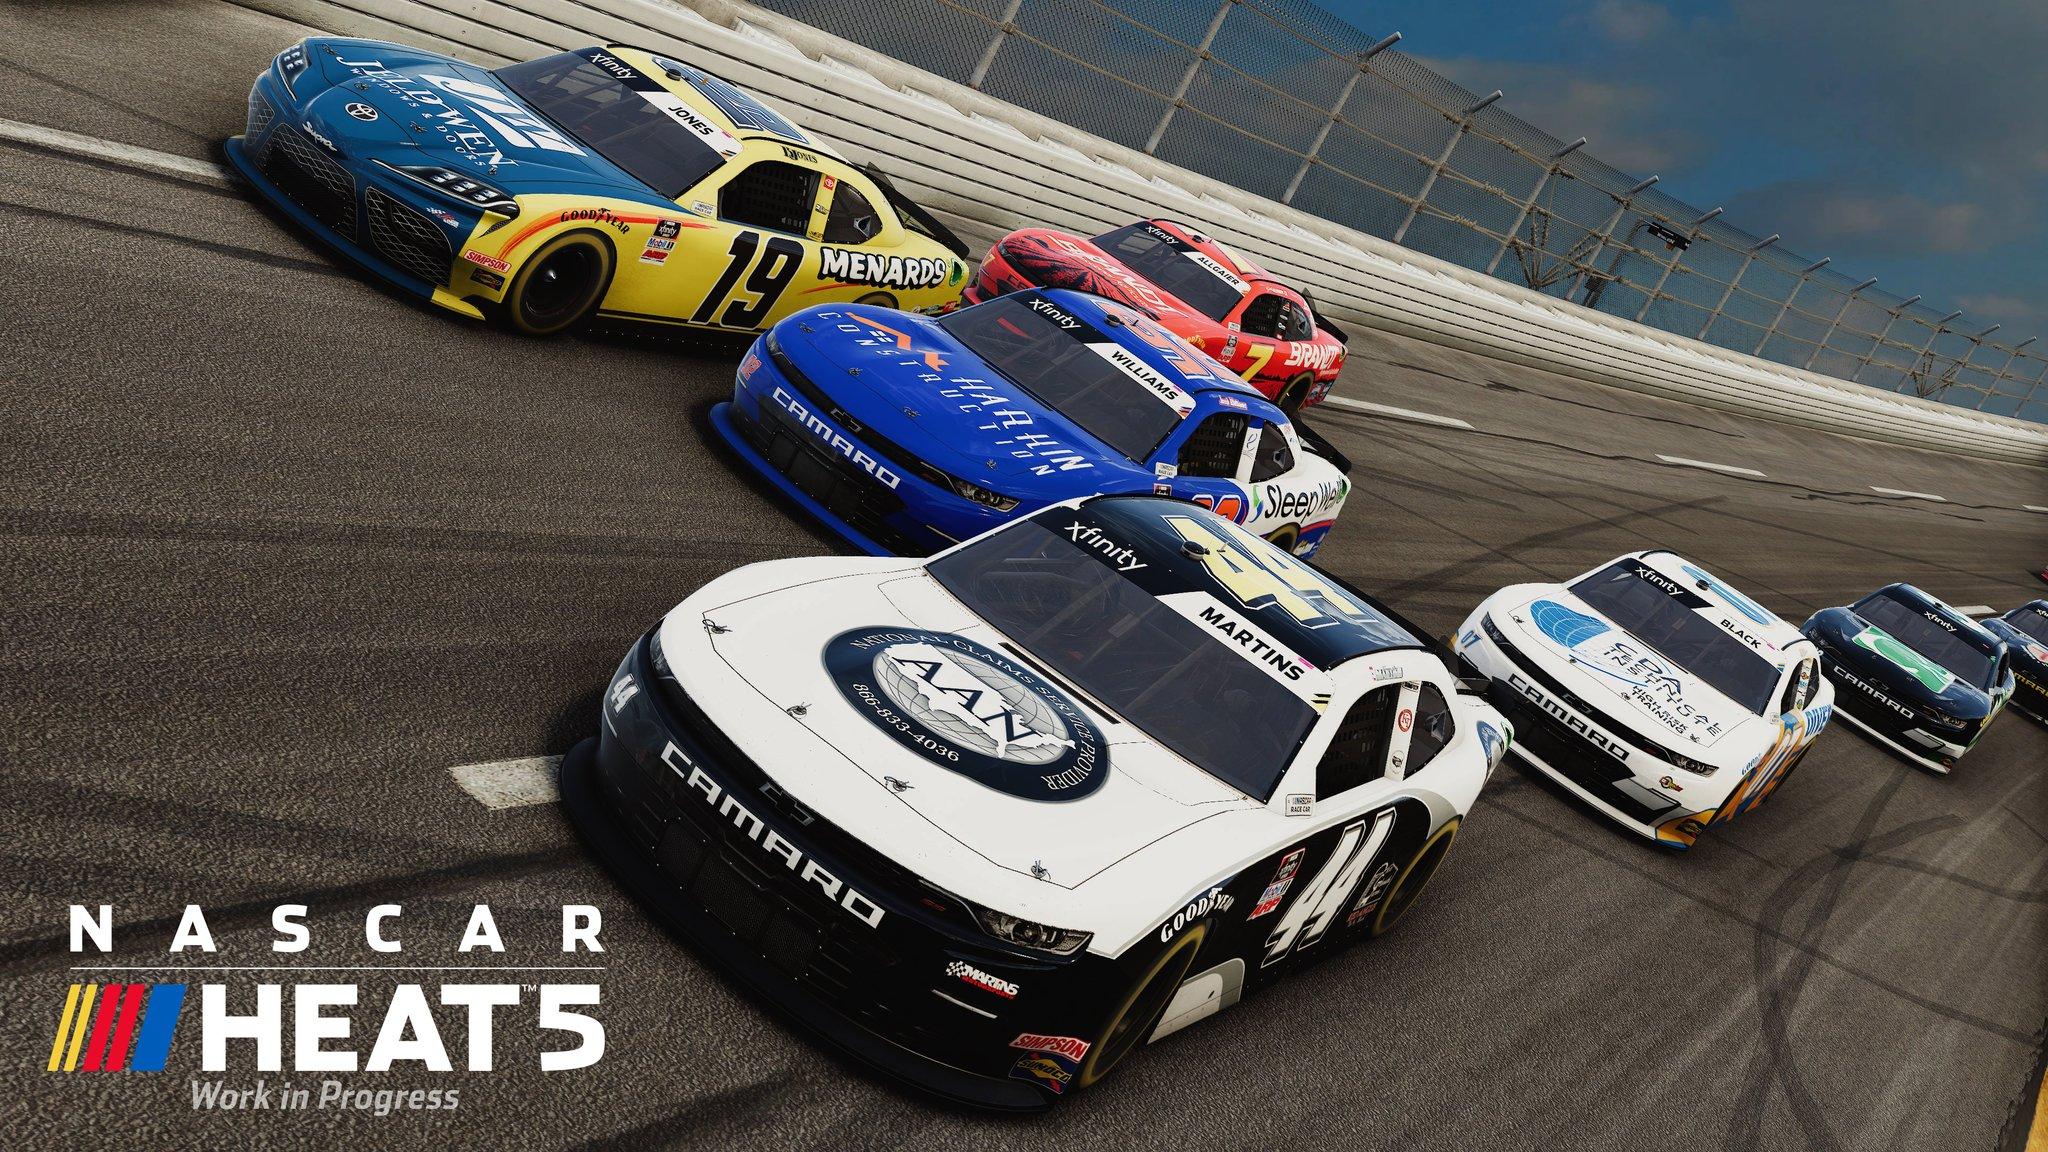 NASCAR-Heat-5-6